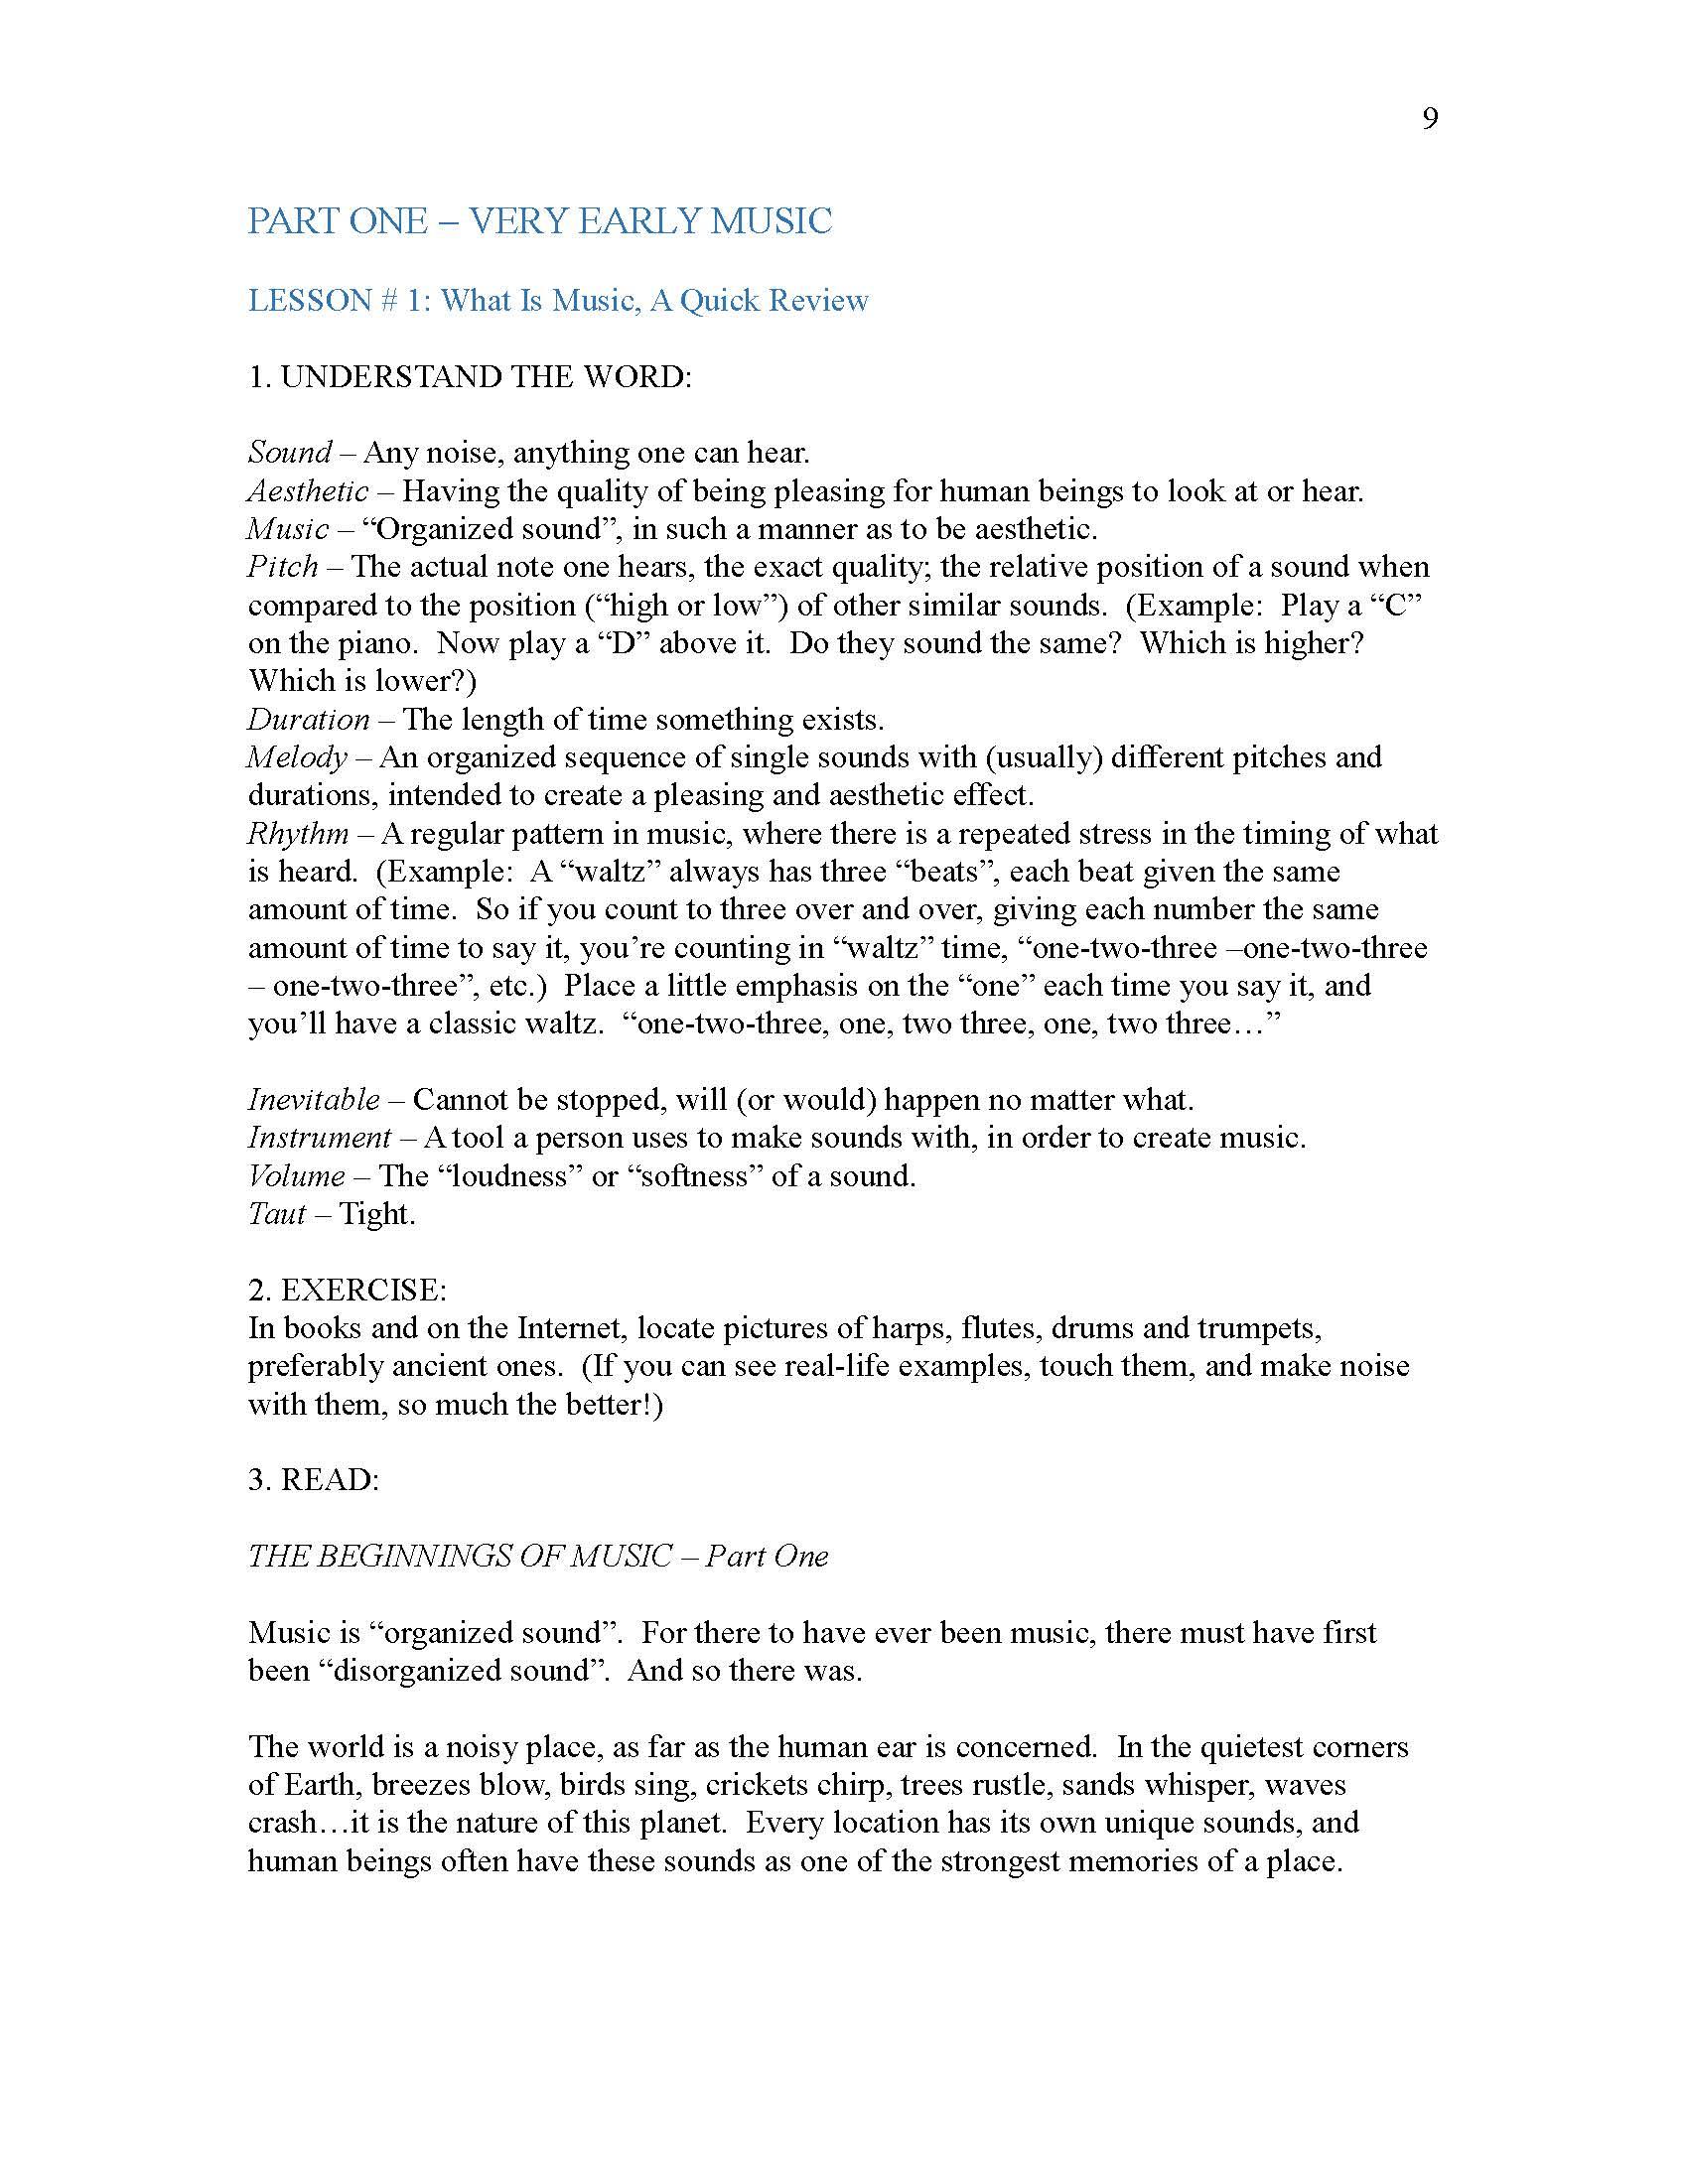 STEP 3-4 - Music Theory 3 - Basic Music History_Page_010.jpg